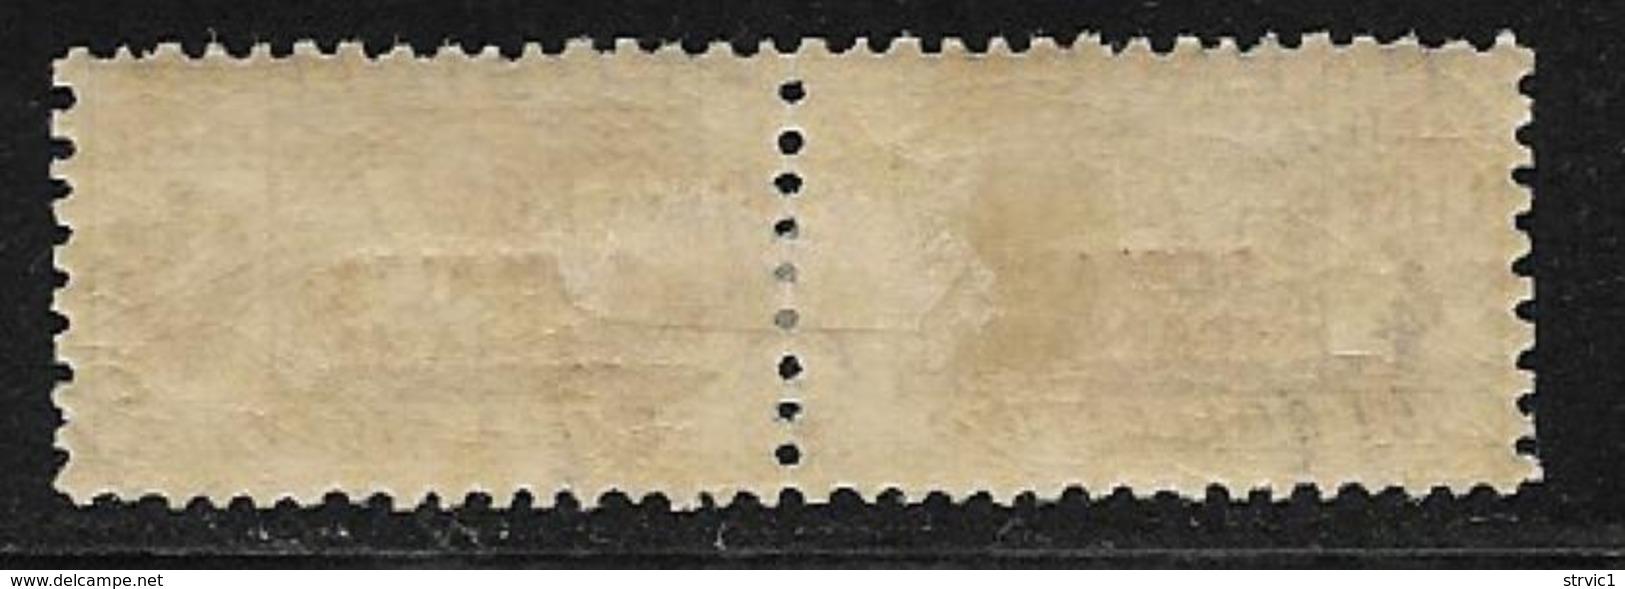 Somalia Scott # Q33 Mint Hinged Italy Parcel Post Stamp,1926, CV$27.00 - Somalia